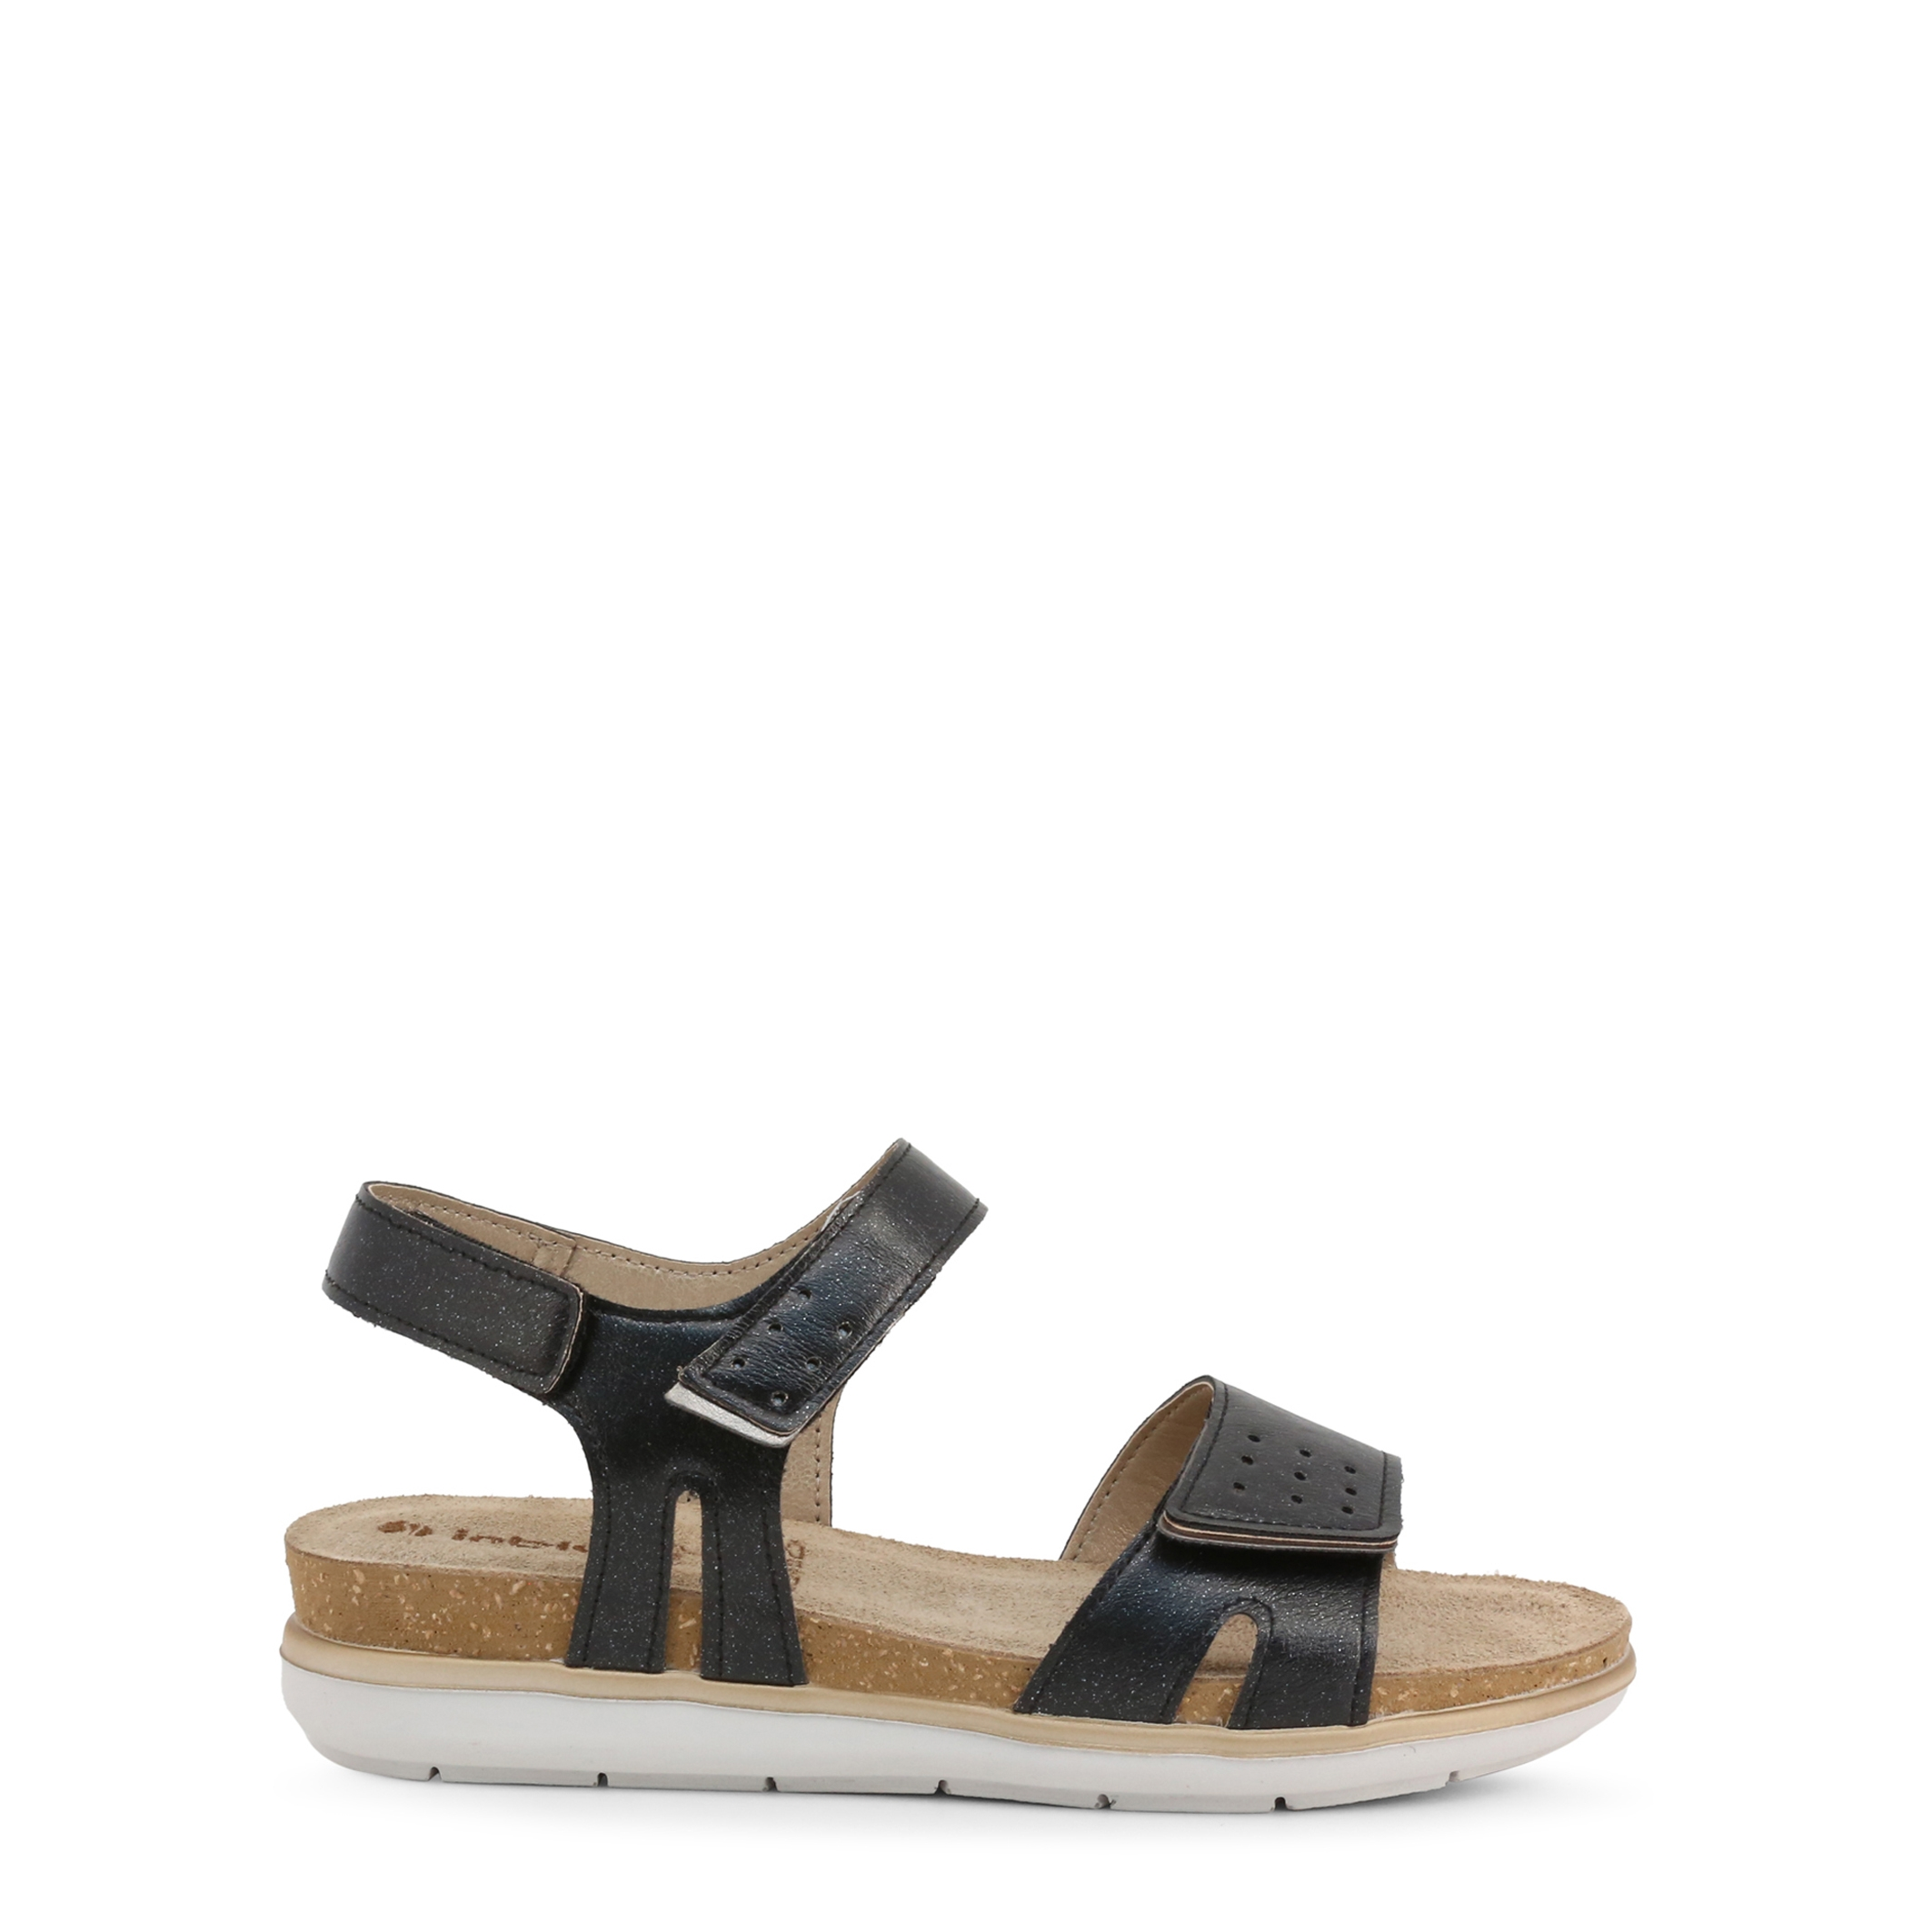 Sandale Inblu PG000020 Negru